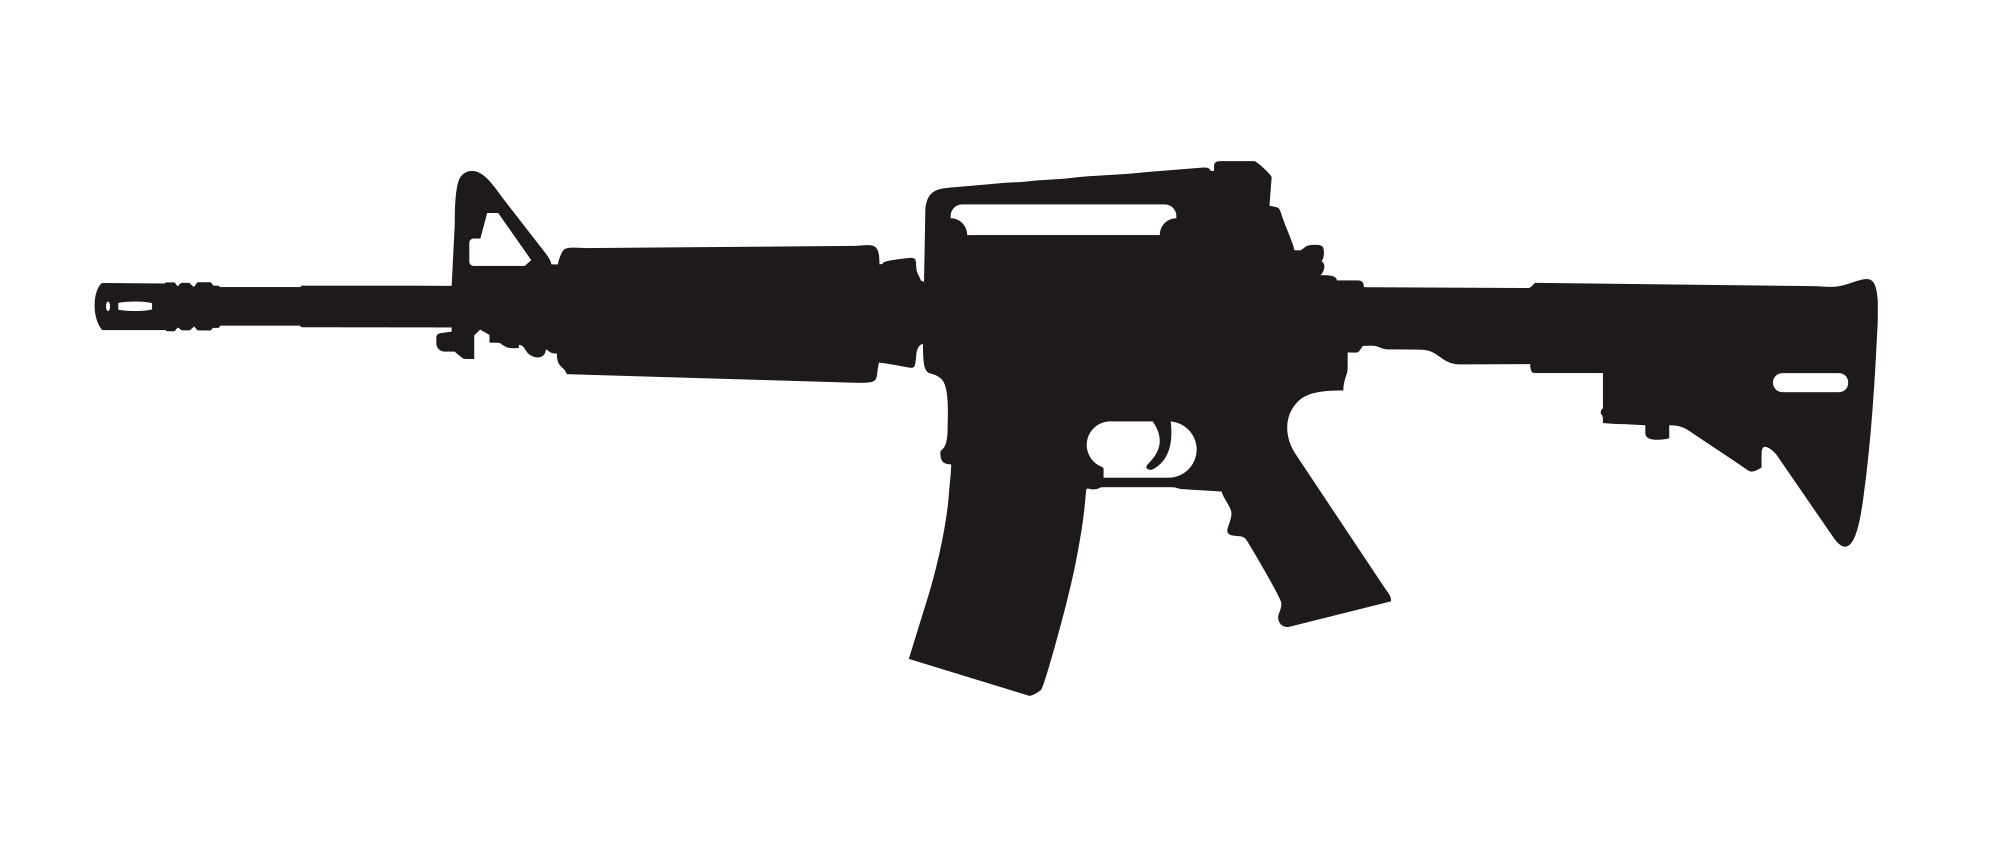 Gun Clipart Svg Gun Svg Transparent Free For Download On